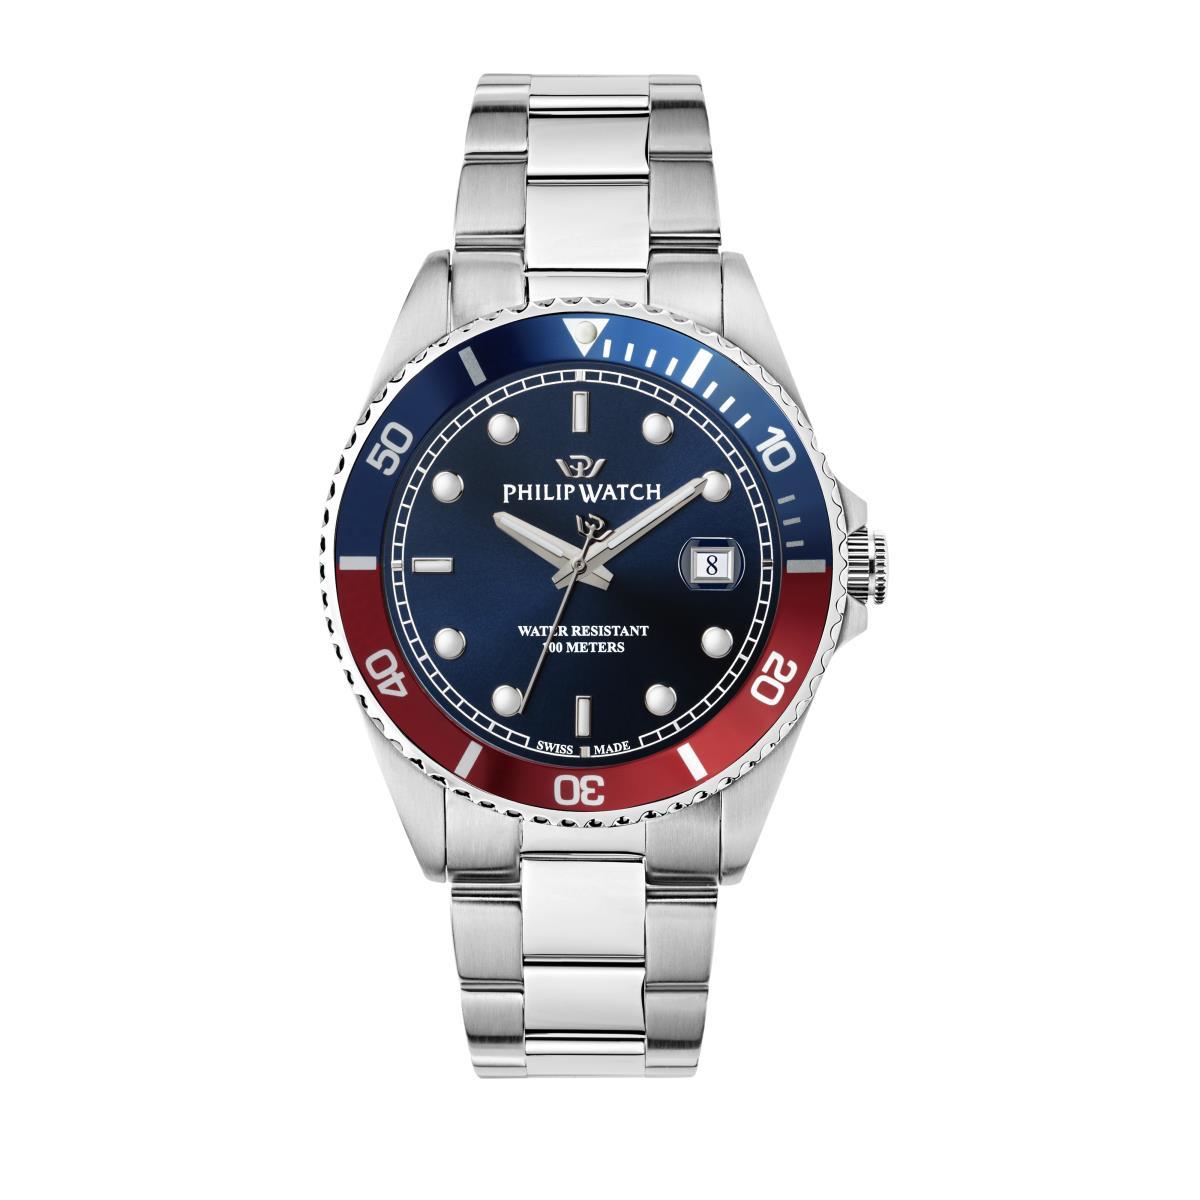 Orologio Philip Watch - Caribe Ref. R8253597052 - PHILIP WATCH